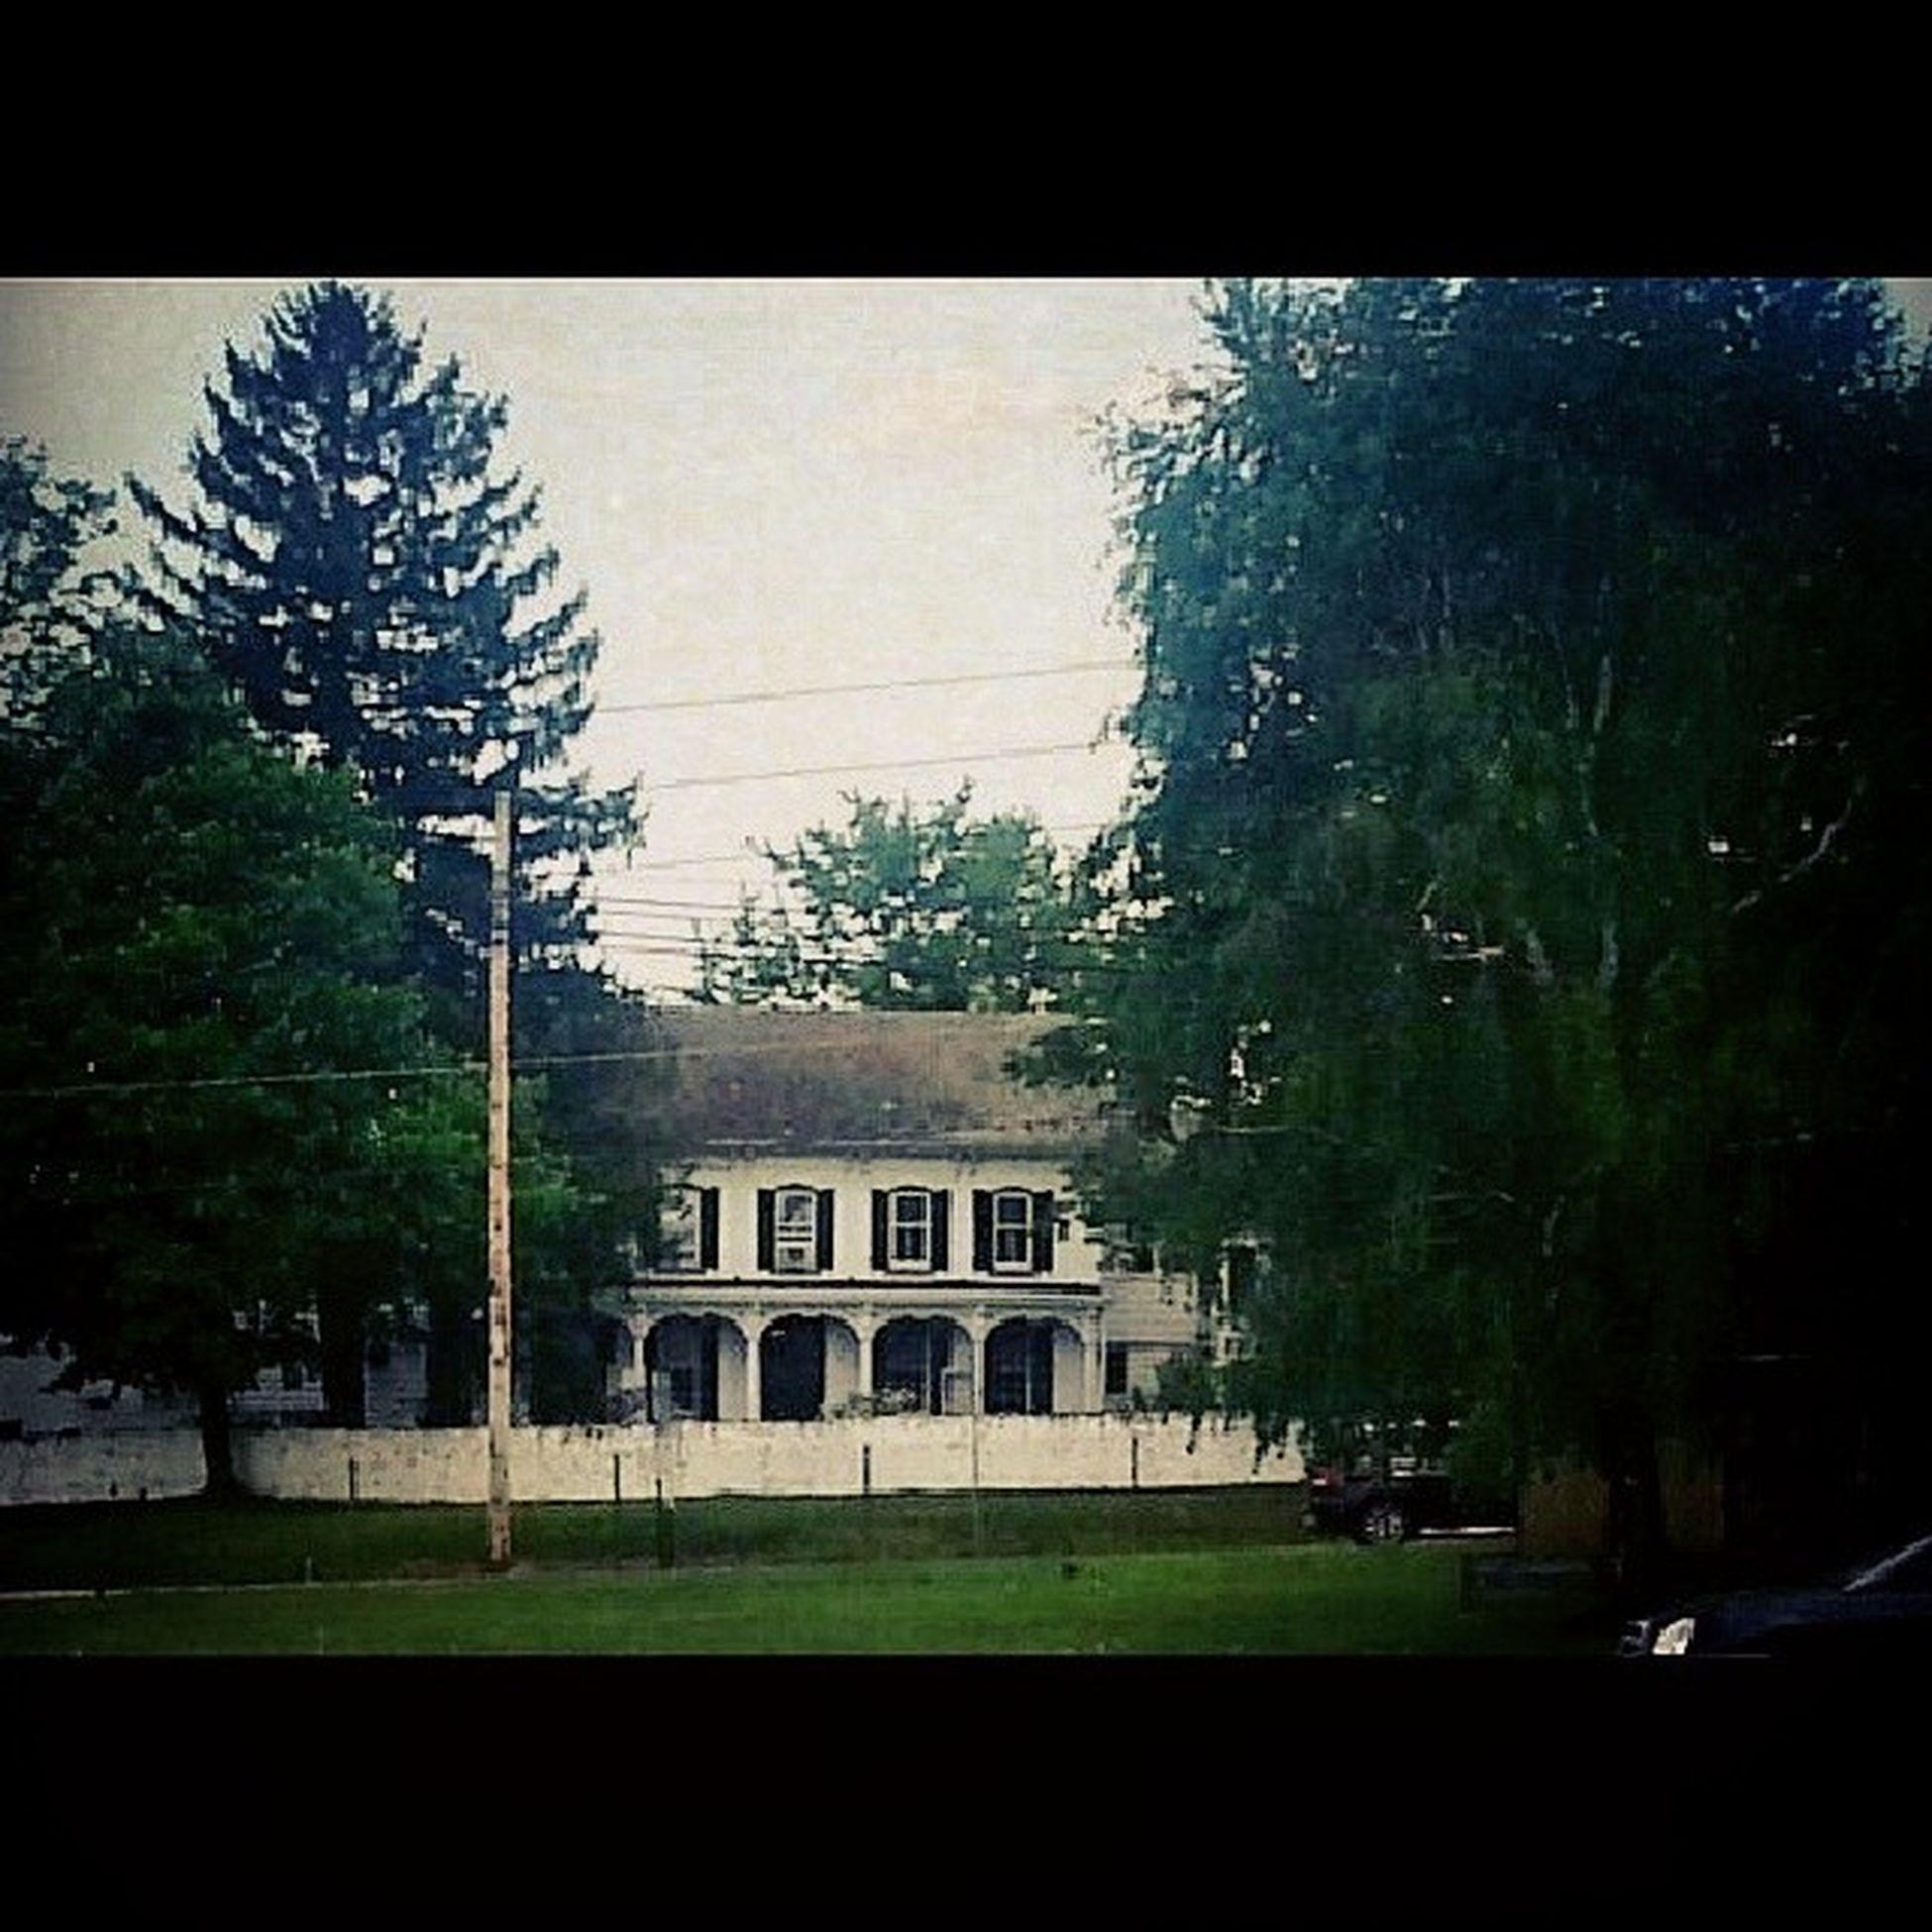 Inn at Turkey Hill Historiclandmarks 1839 Brick Farmhouse Alleghenies appalachia Americangothic